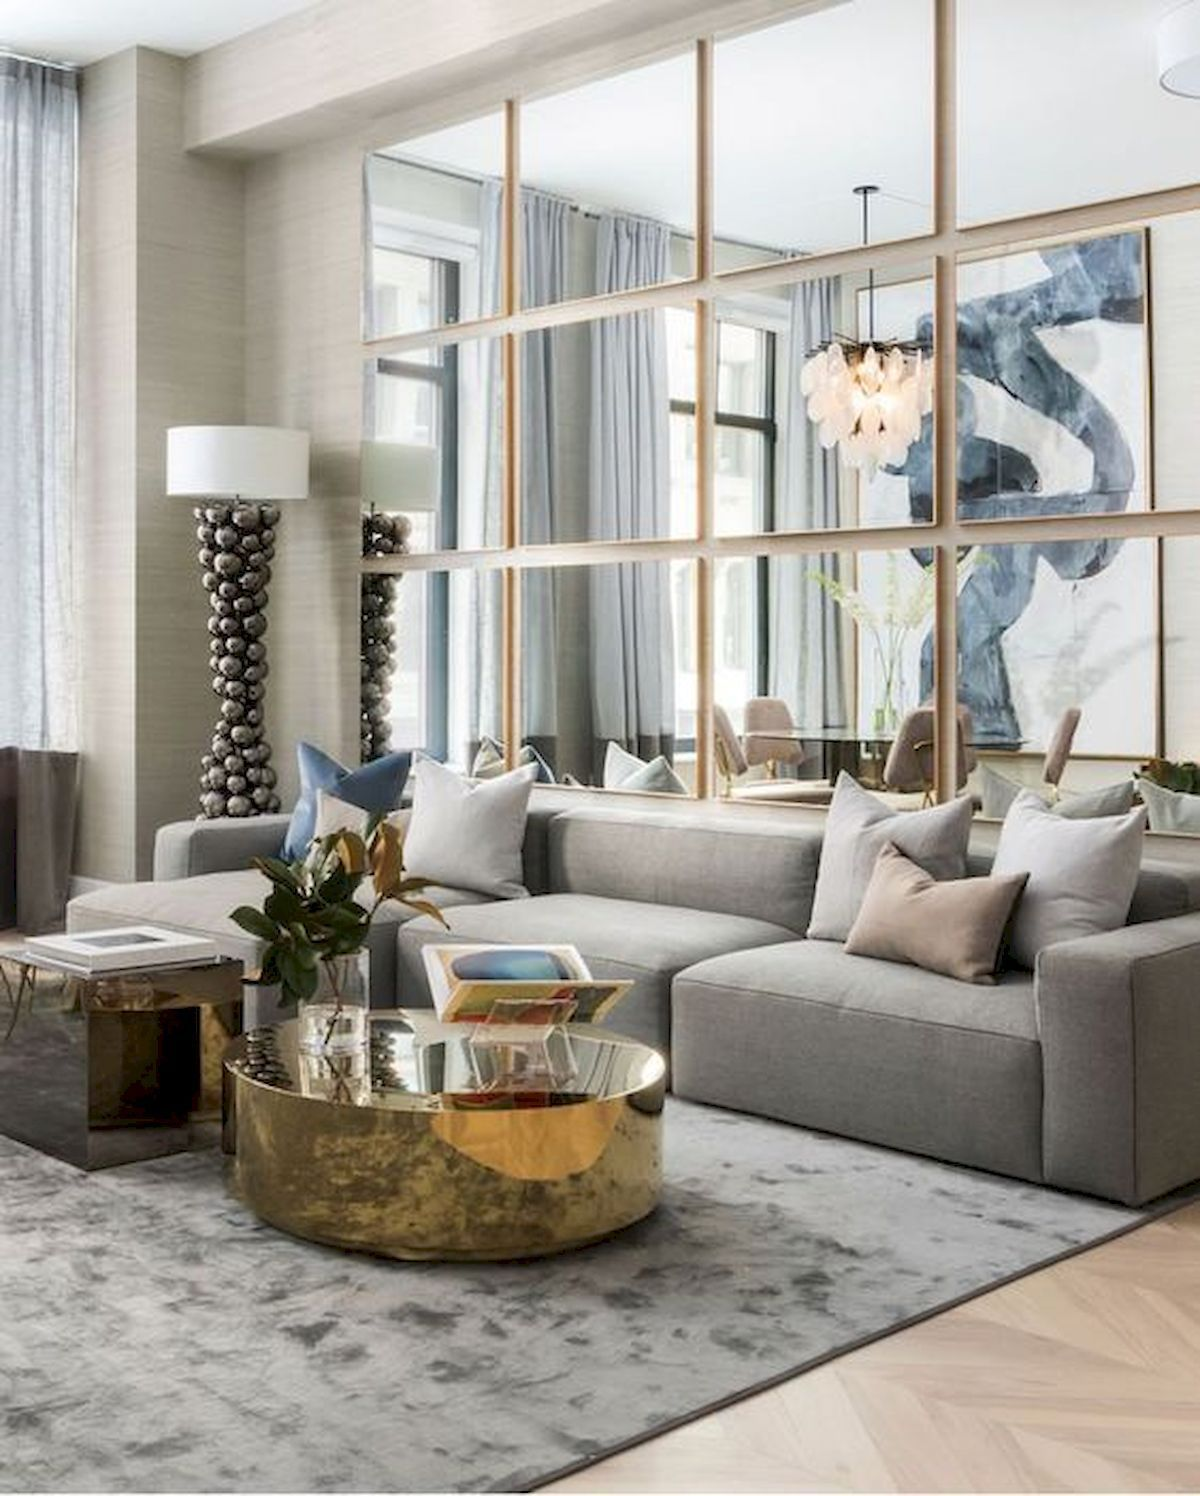 36 Elegant Living Room Design And Decor Ideas 1 Elegant Living Room Elegant Living Room Design Living Room Mirrors